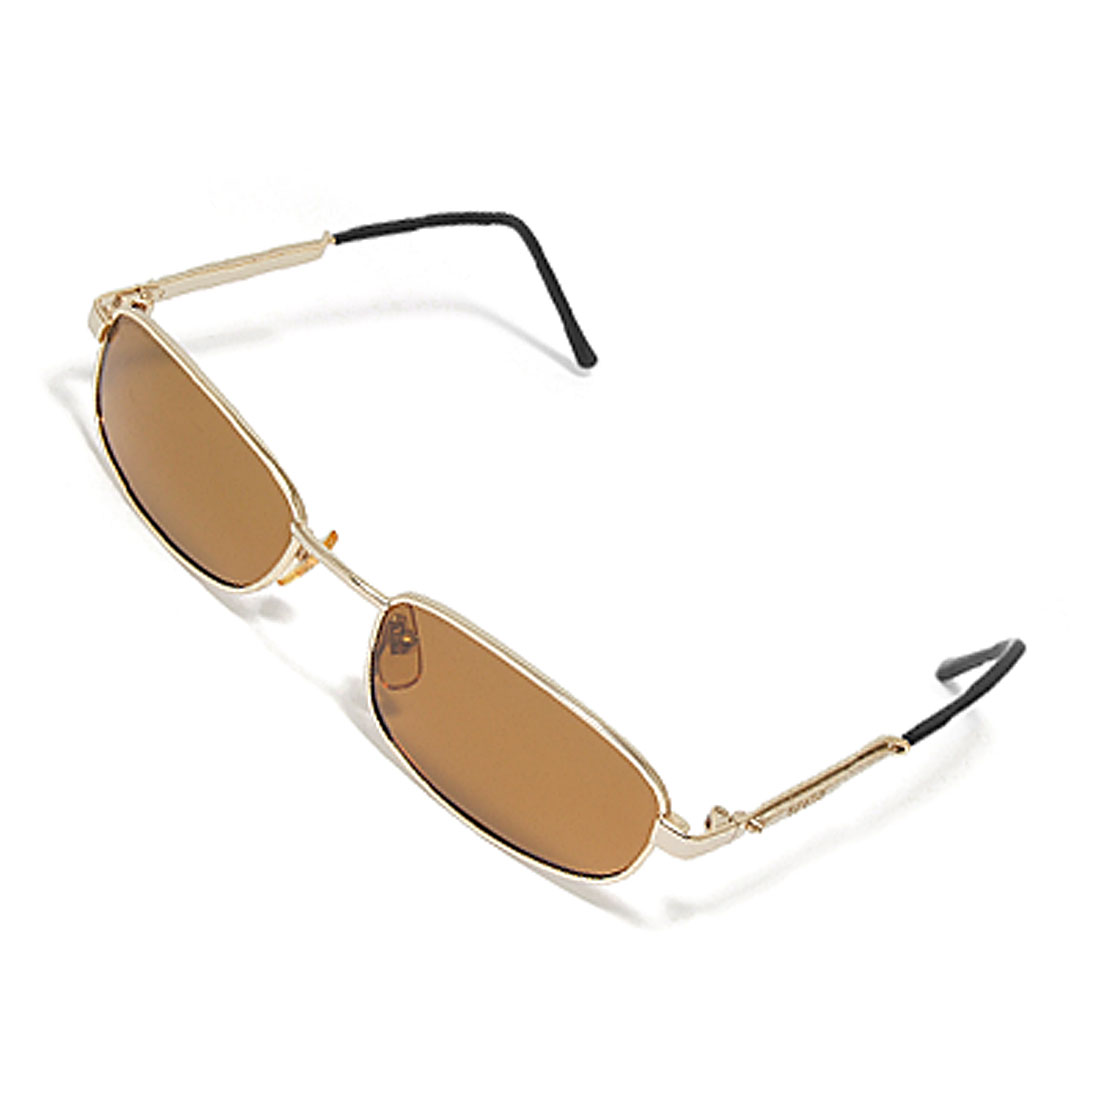 Adult Men's Brown Polarized Lens Eyewear Glasses Sunglasses